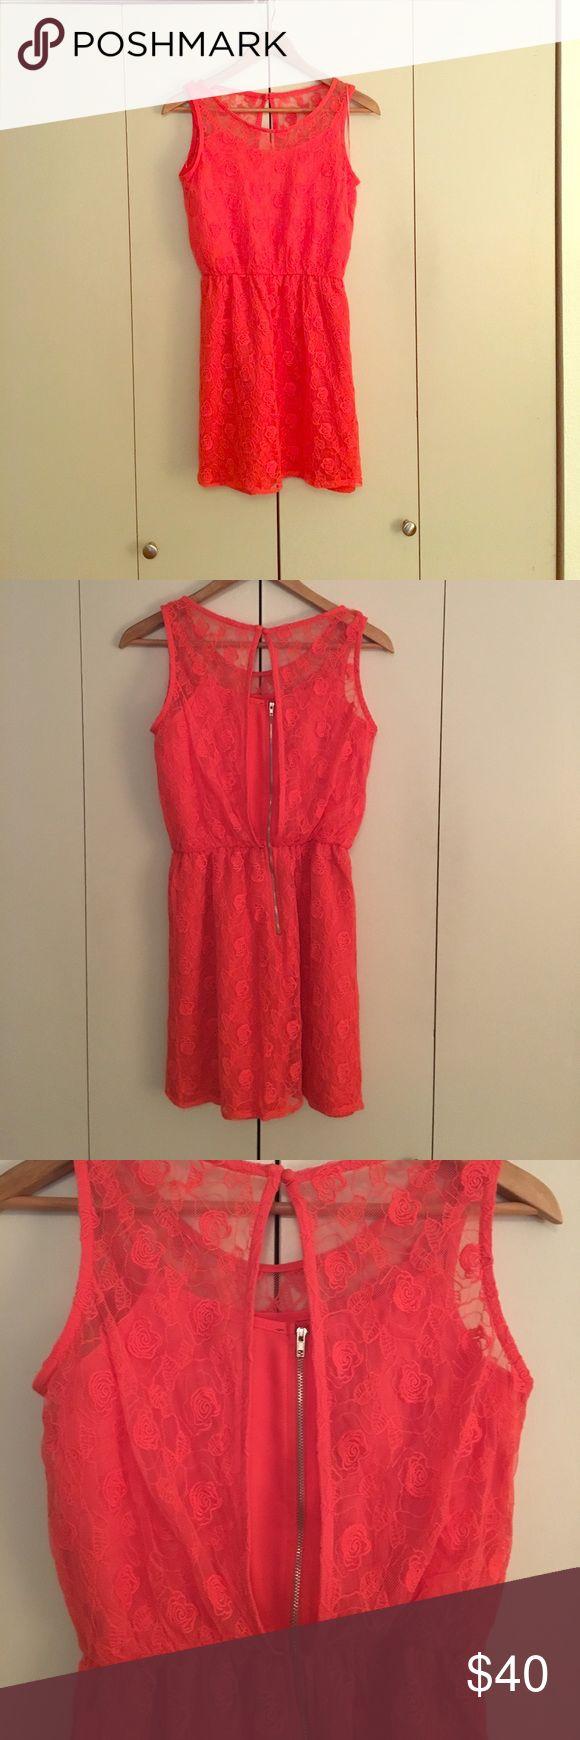 Salmon Colored Herringbone Blazer: 25+ Best Ideas About Salmon Color Dress On Pinterest